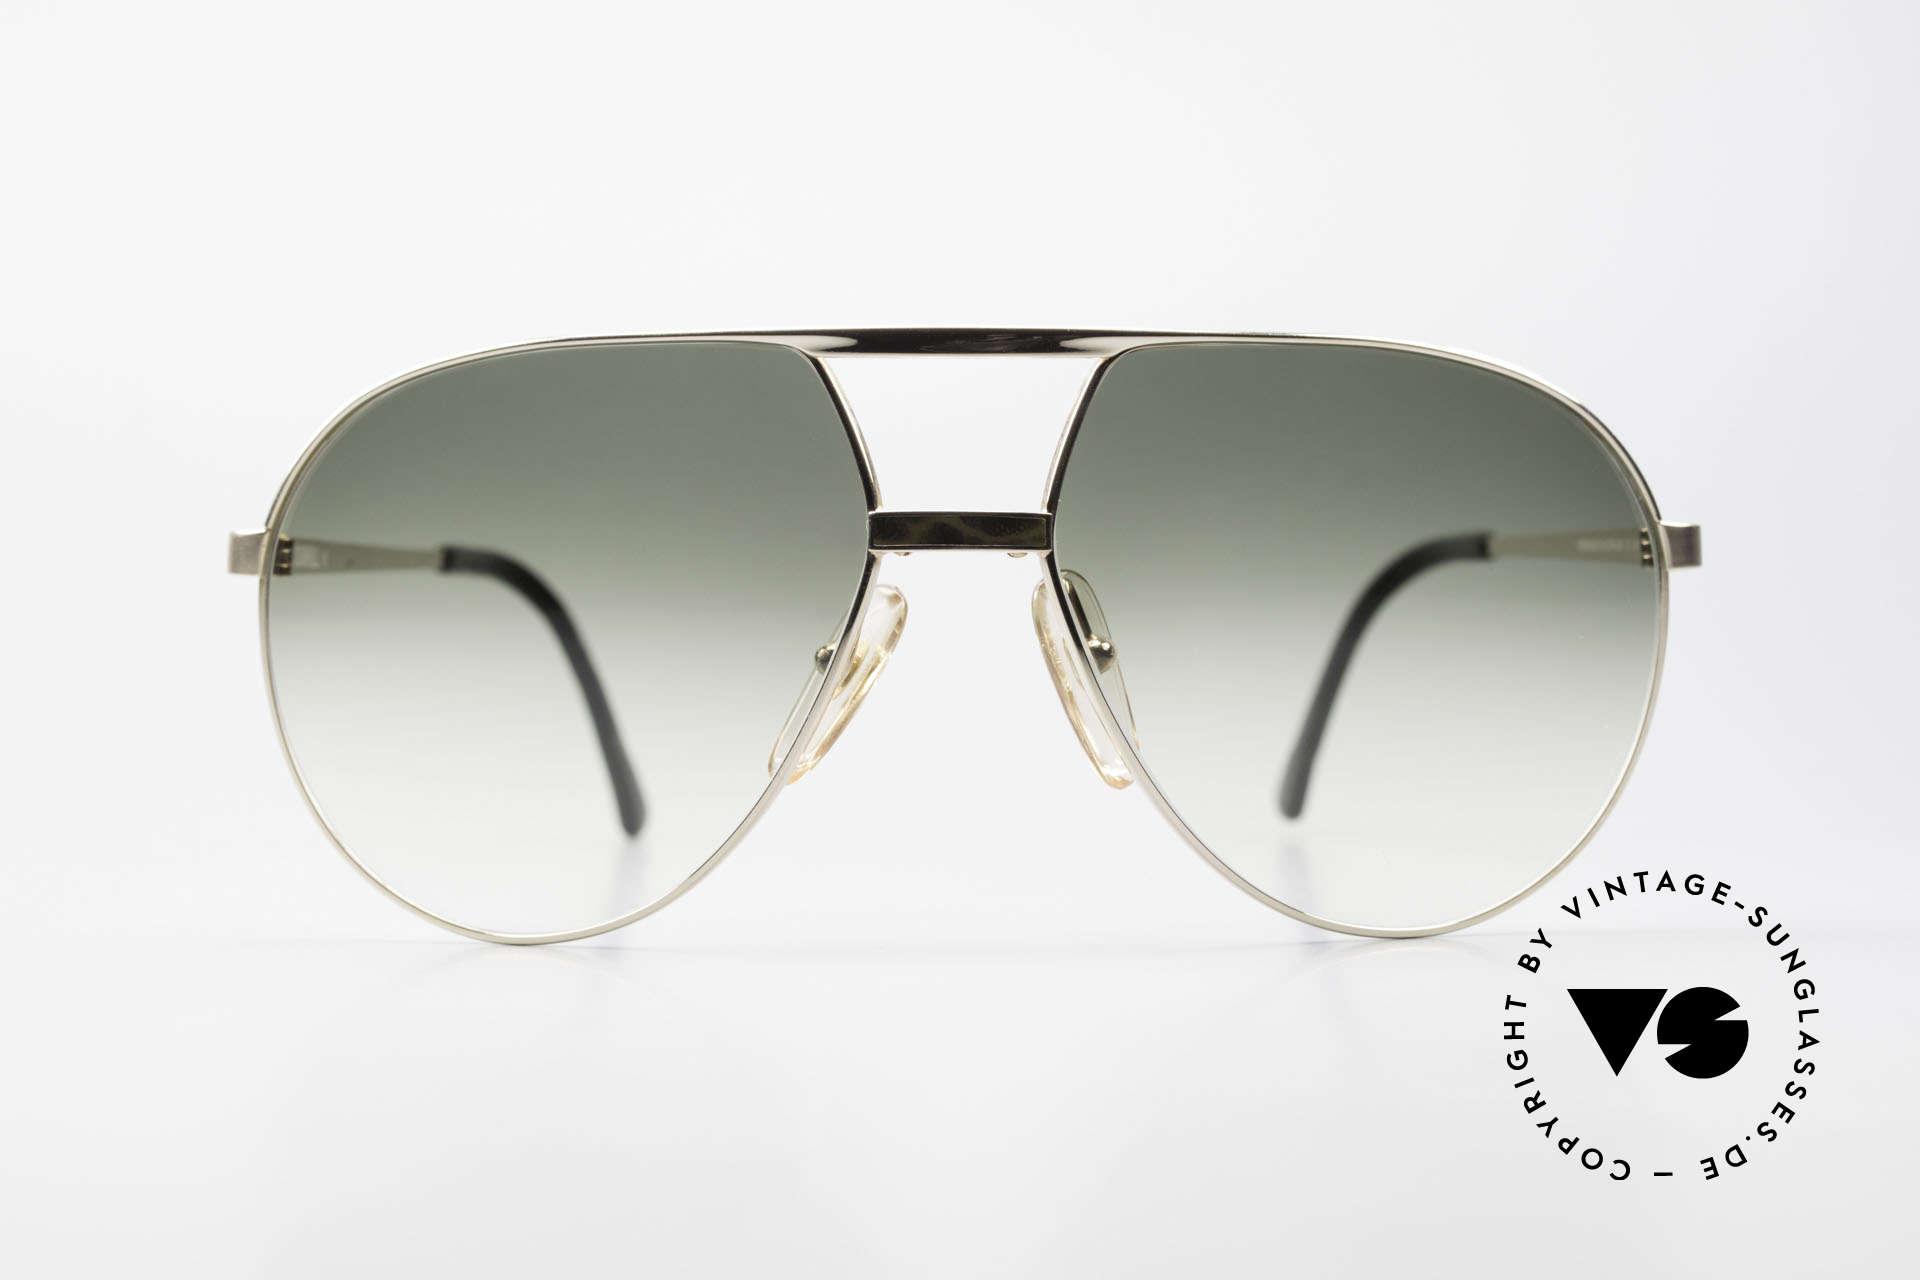 Dunhill 6042 80's Luxury Aviator Sunglasses, noble 80's aviator designer sunglasses by DUNHILL, Made for Men